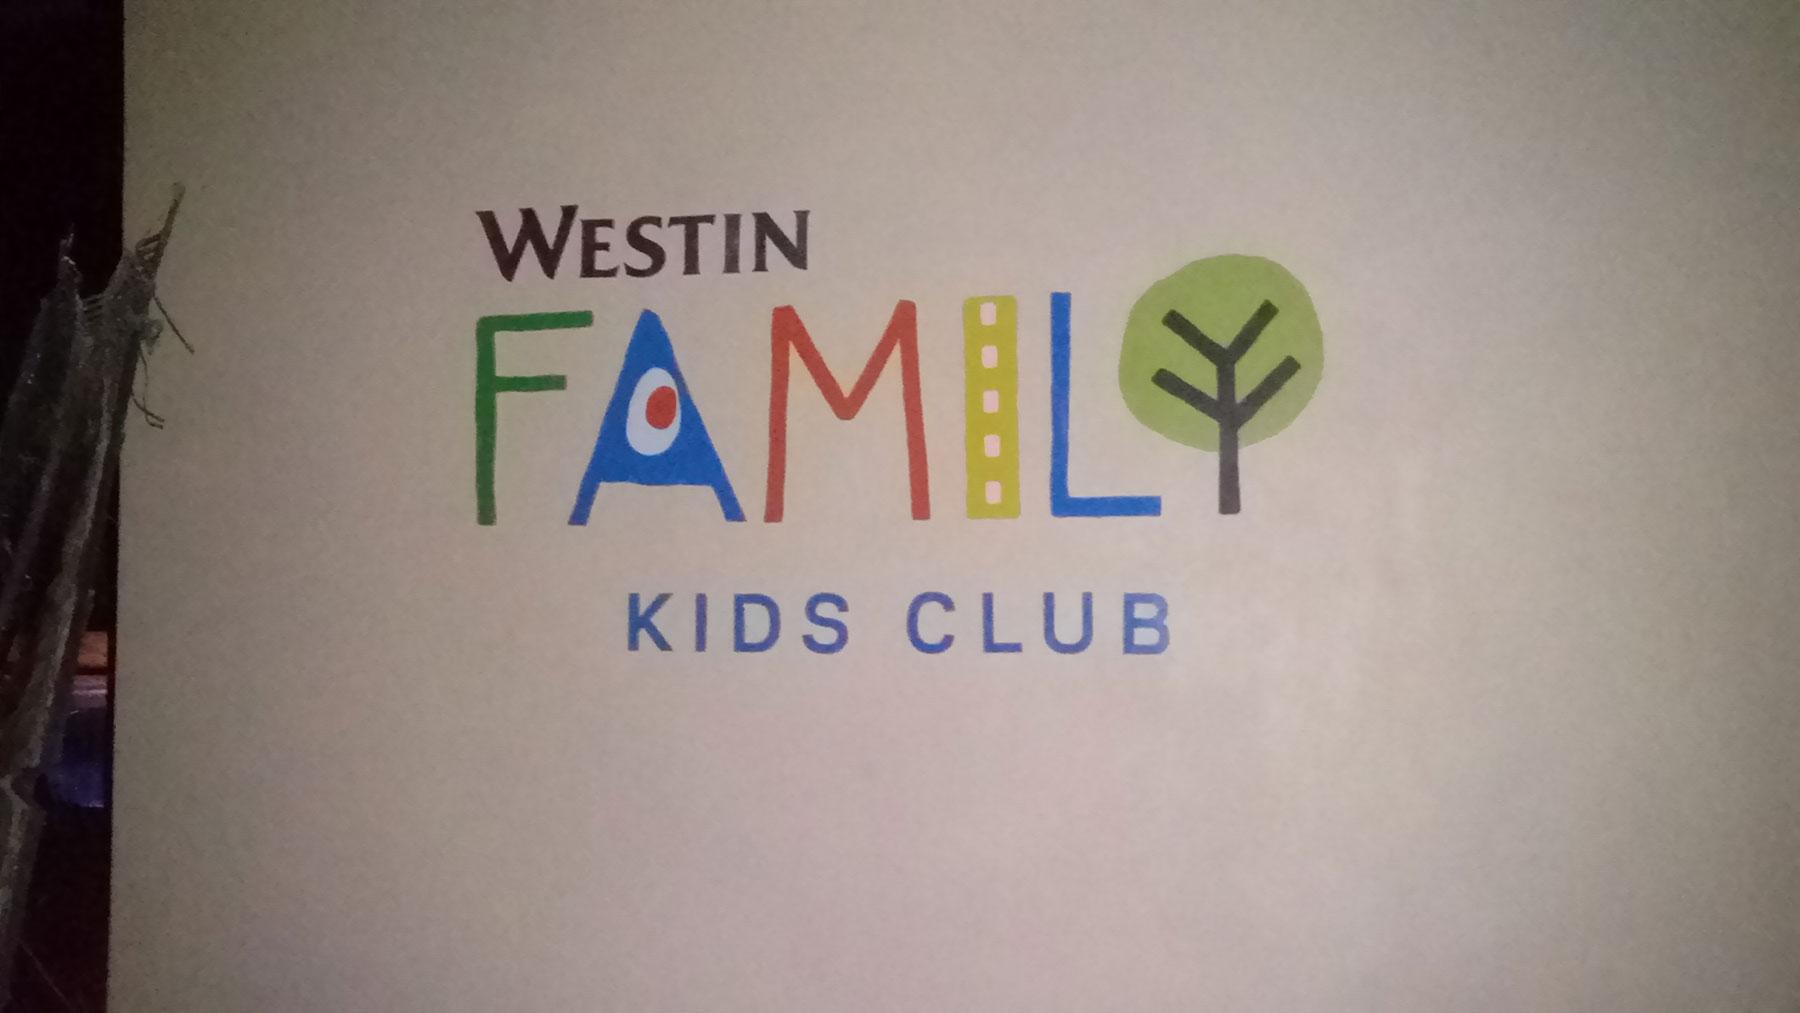 Proyectos SPAD Constructora, Westin Family Kids Club, Logo entrada, Diseño de Interiores, Arquitectura, Puerto Vallarta, Jalisco, México